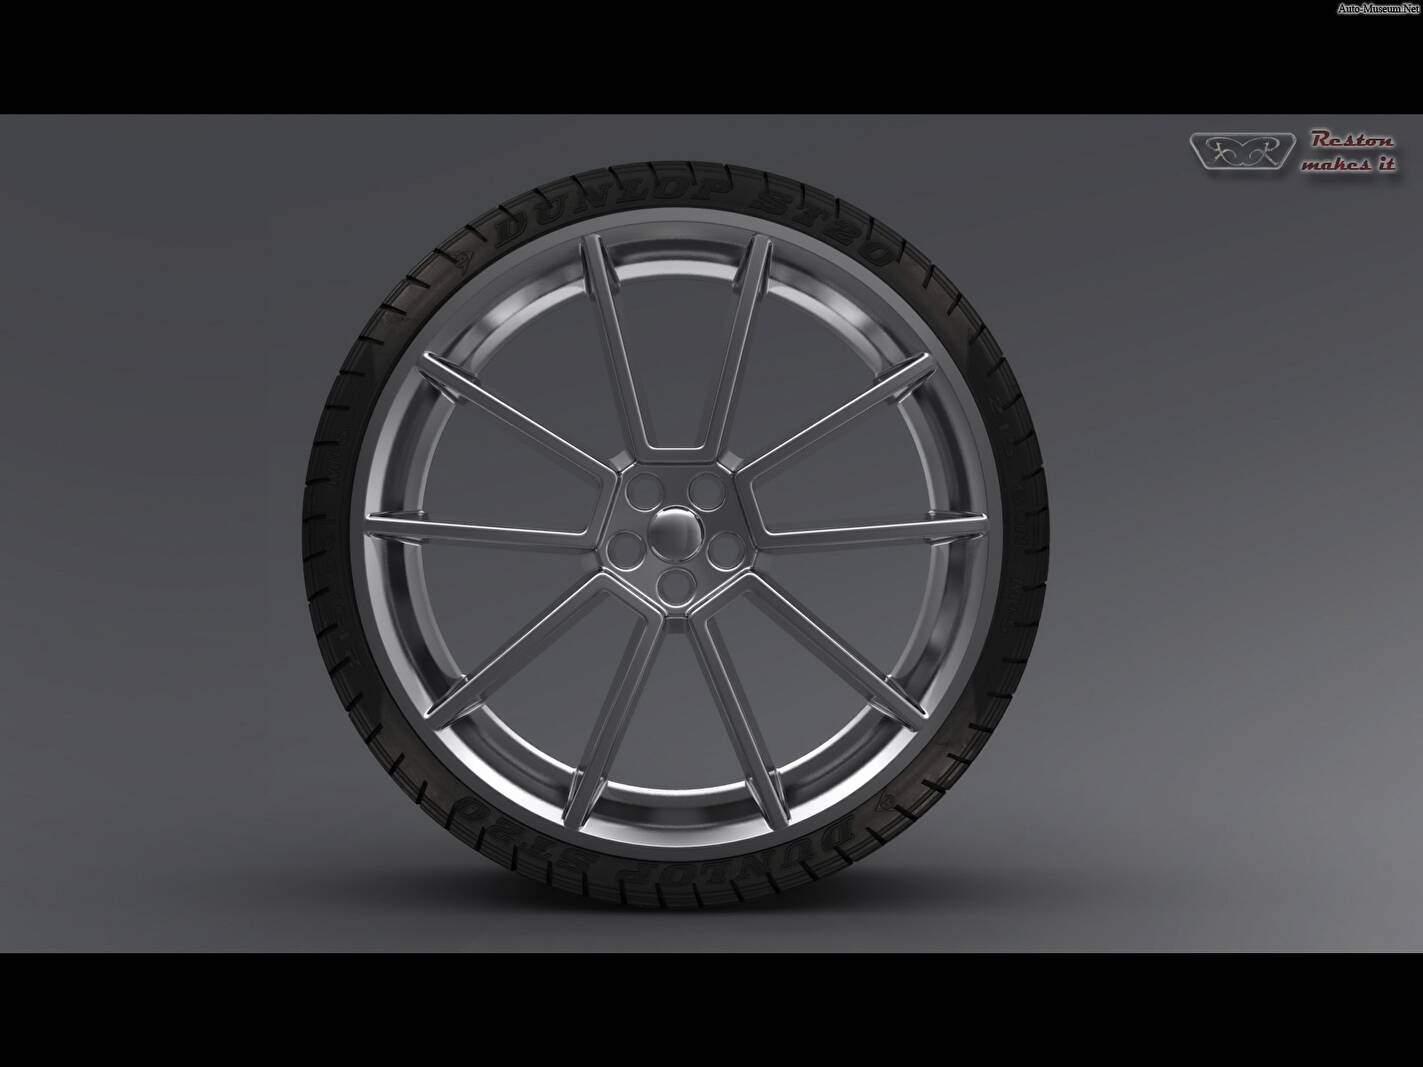 Rafael Reston Cuda Concept Design (2008),  ajouté par MissMP